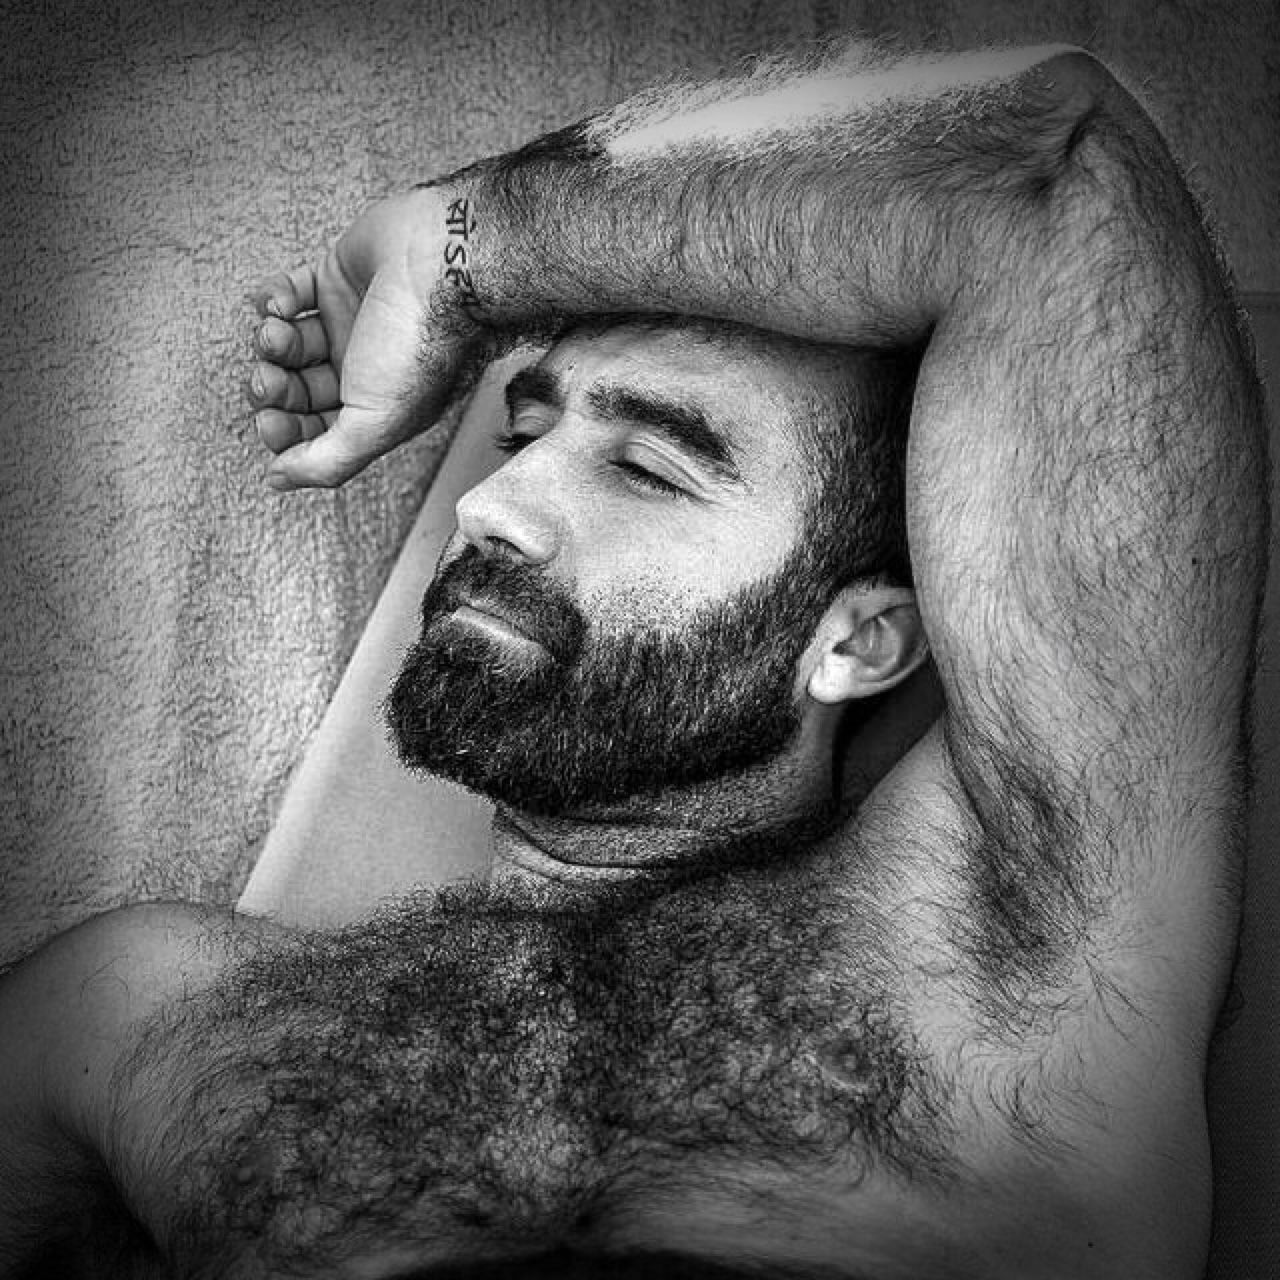 Hairy Beefy Tumblr